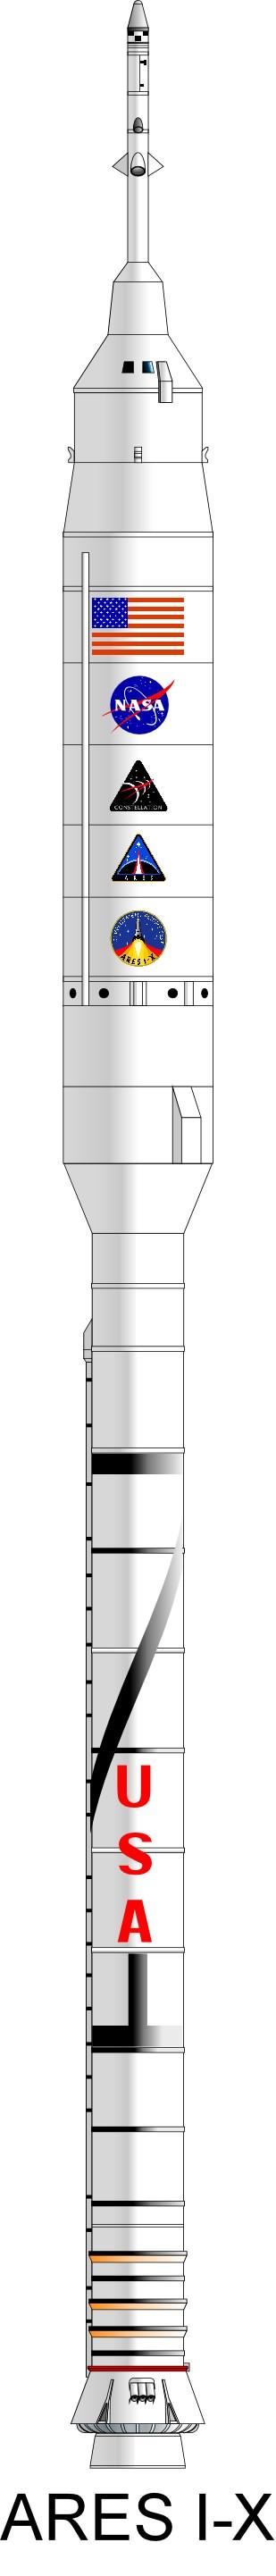 Ares 1-X.jpg